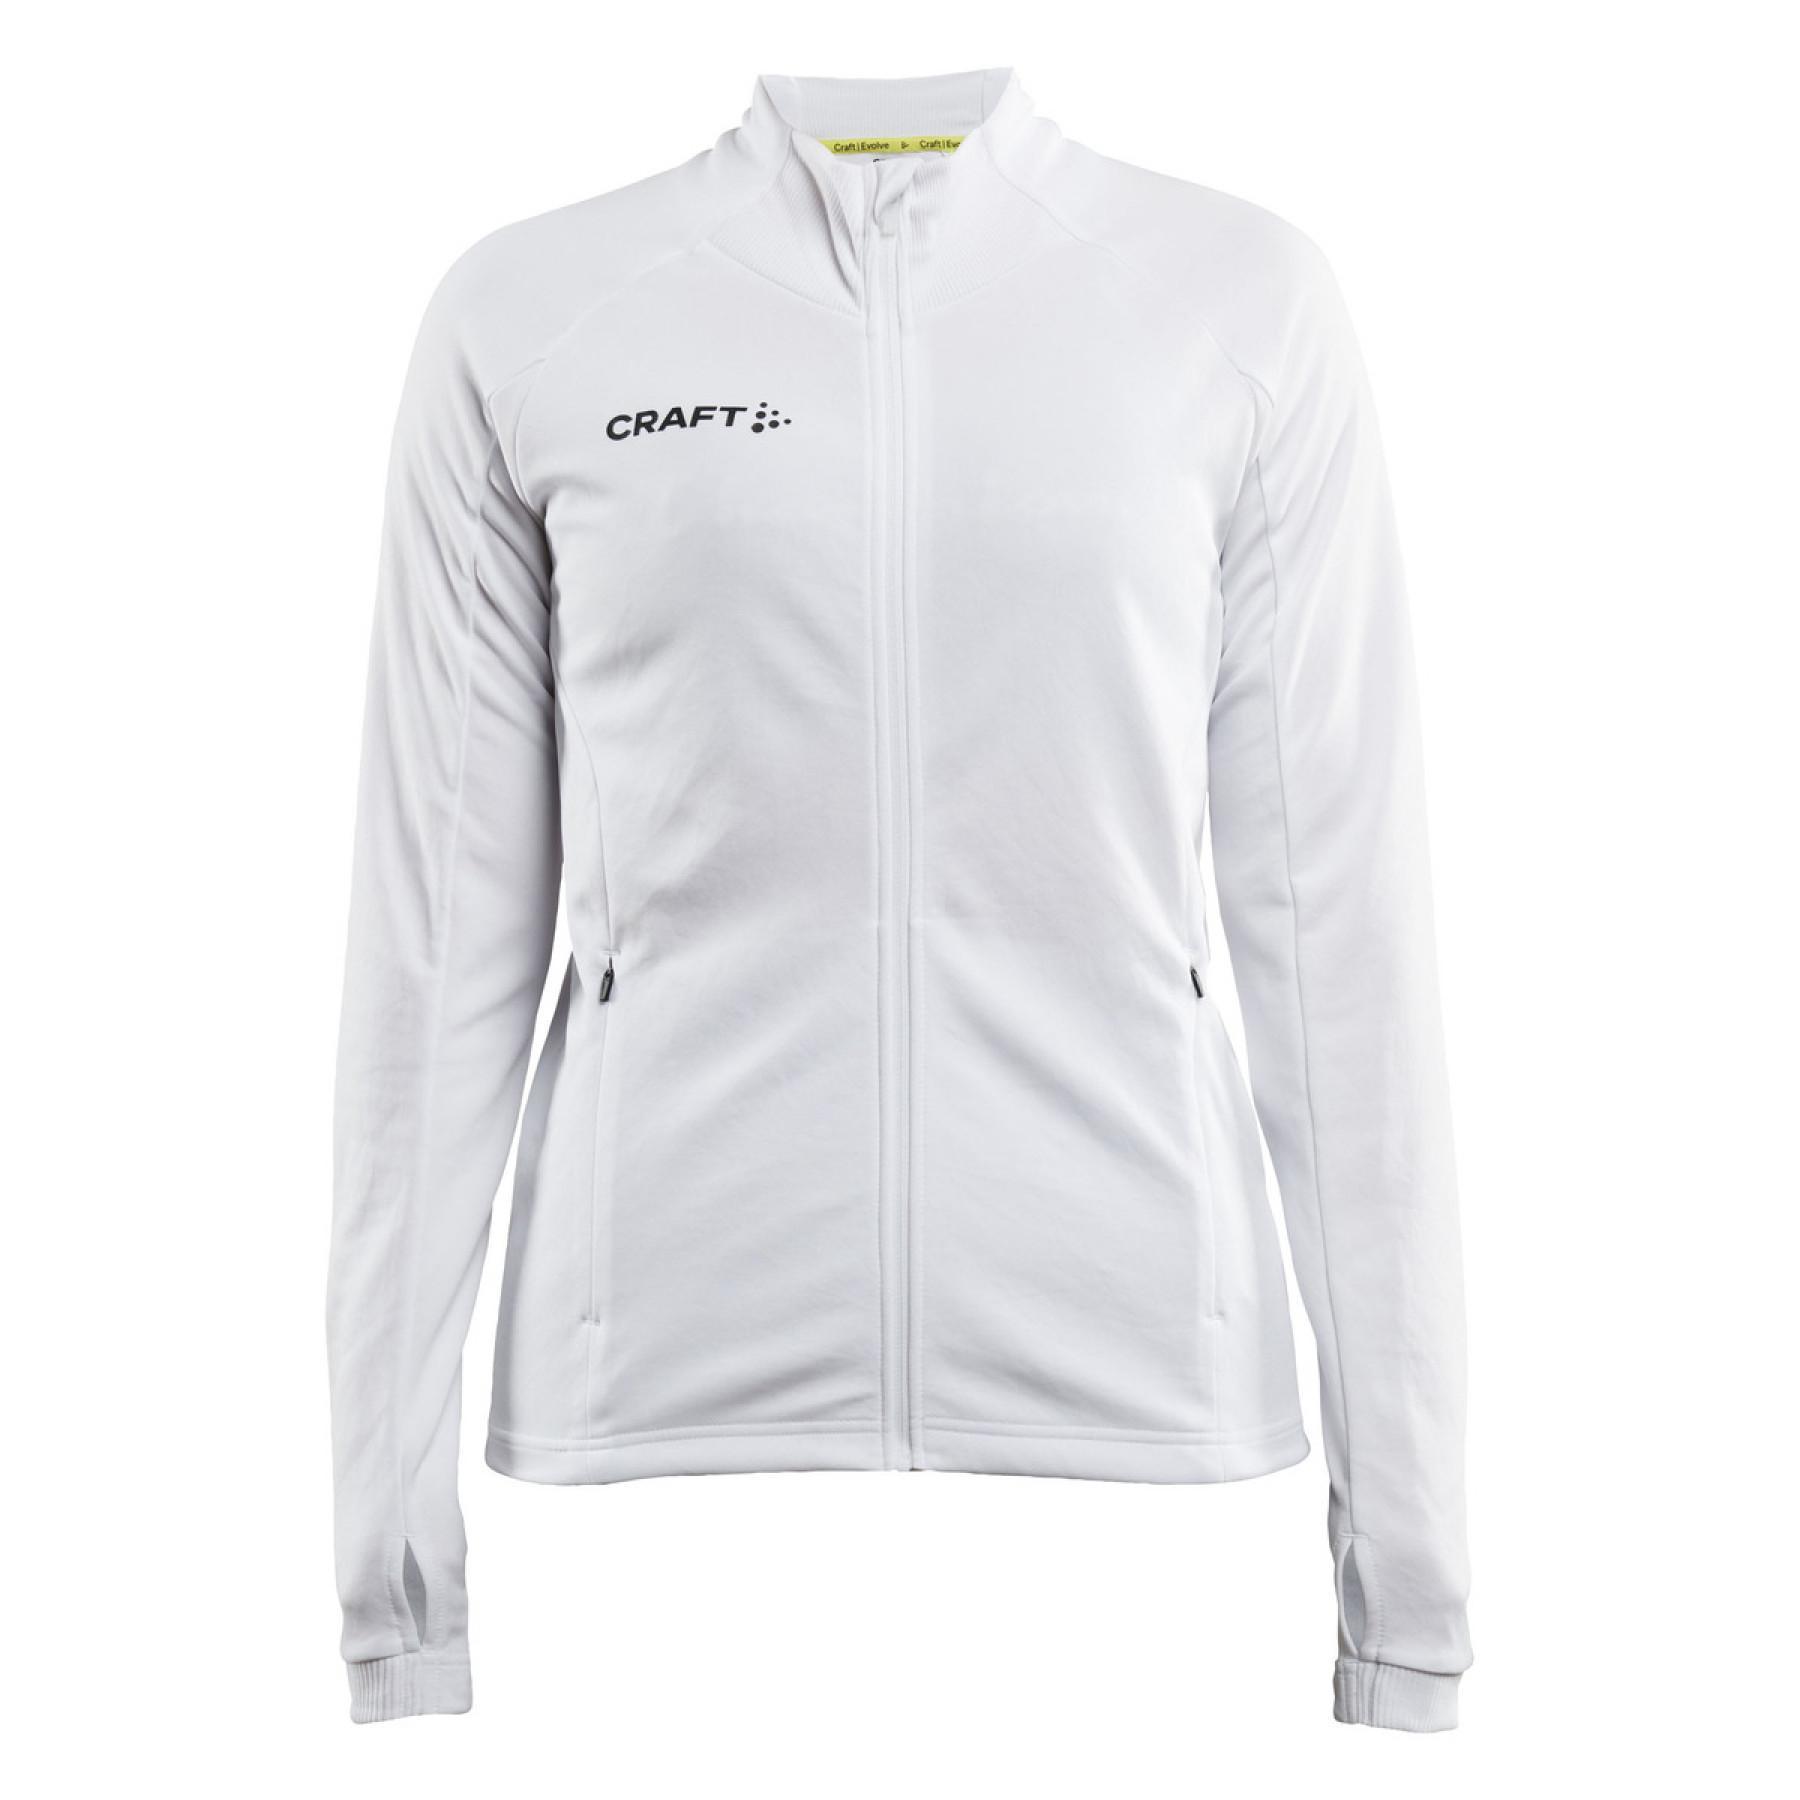 Full zip jacket Craft evolve